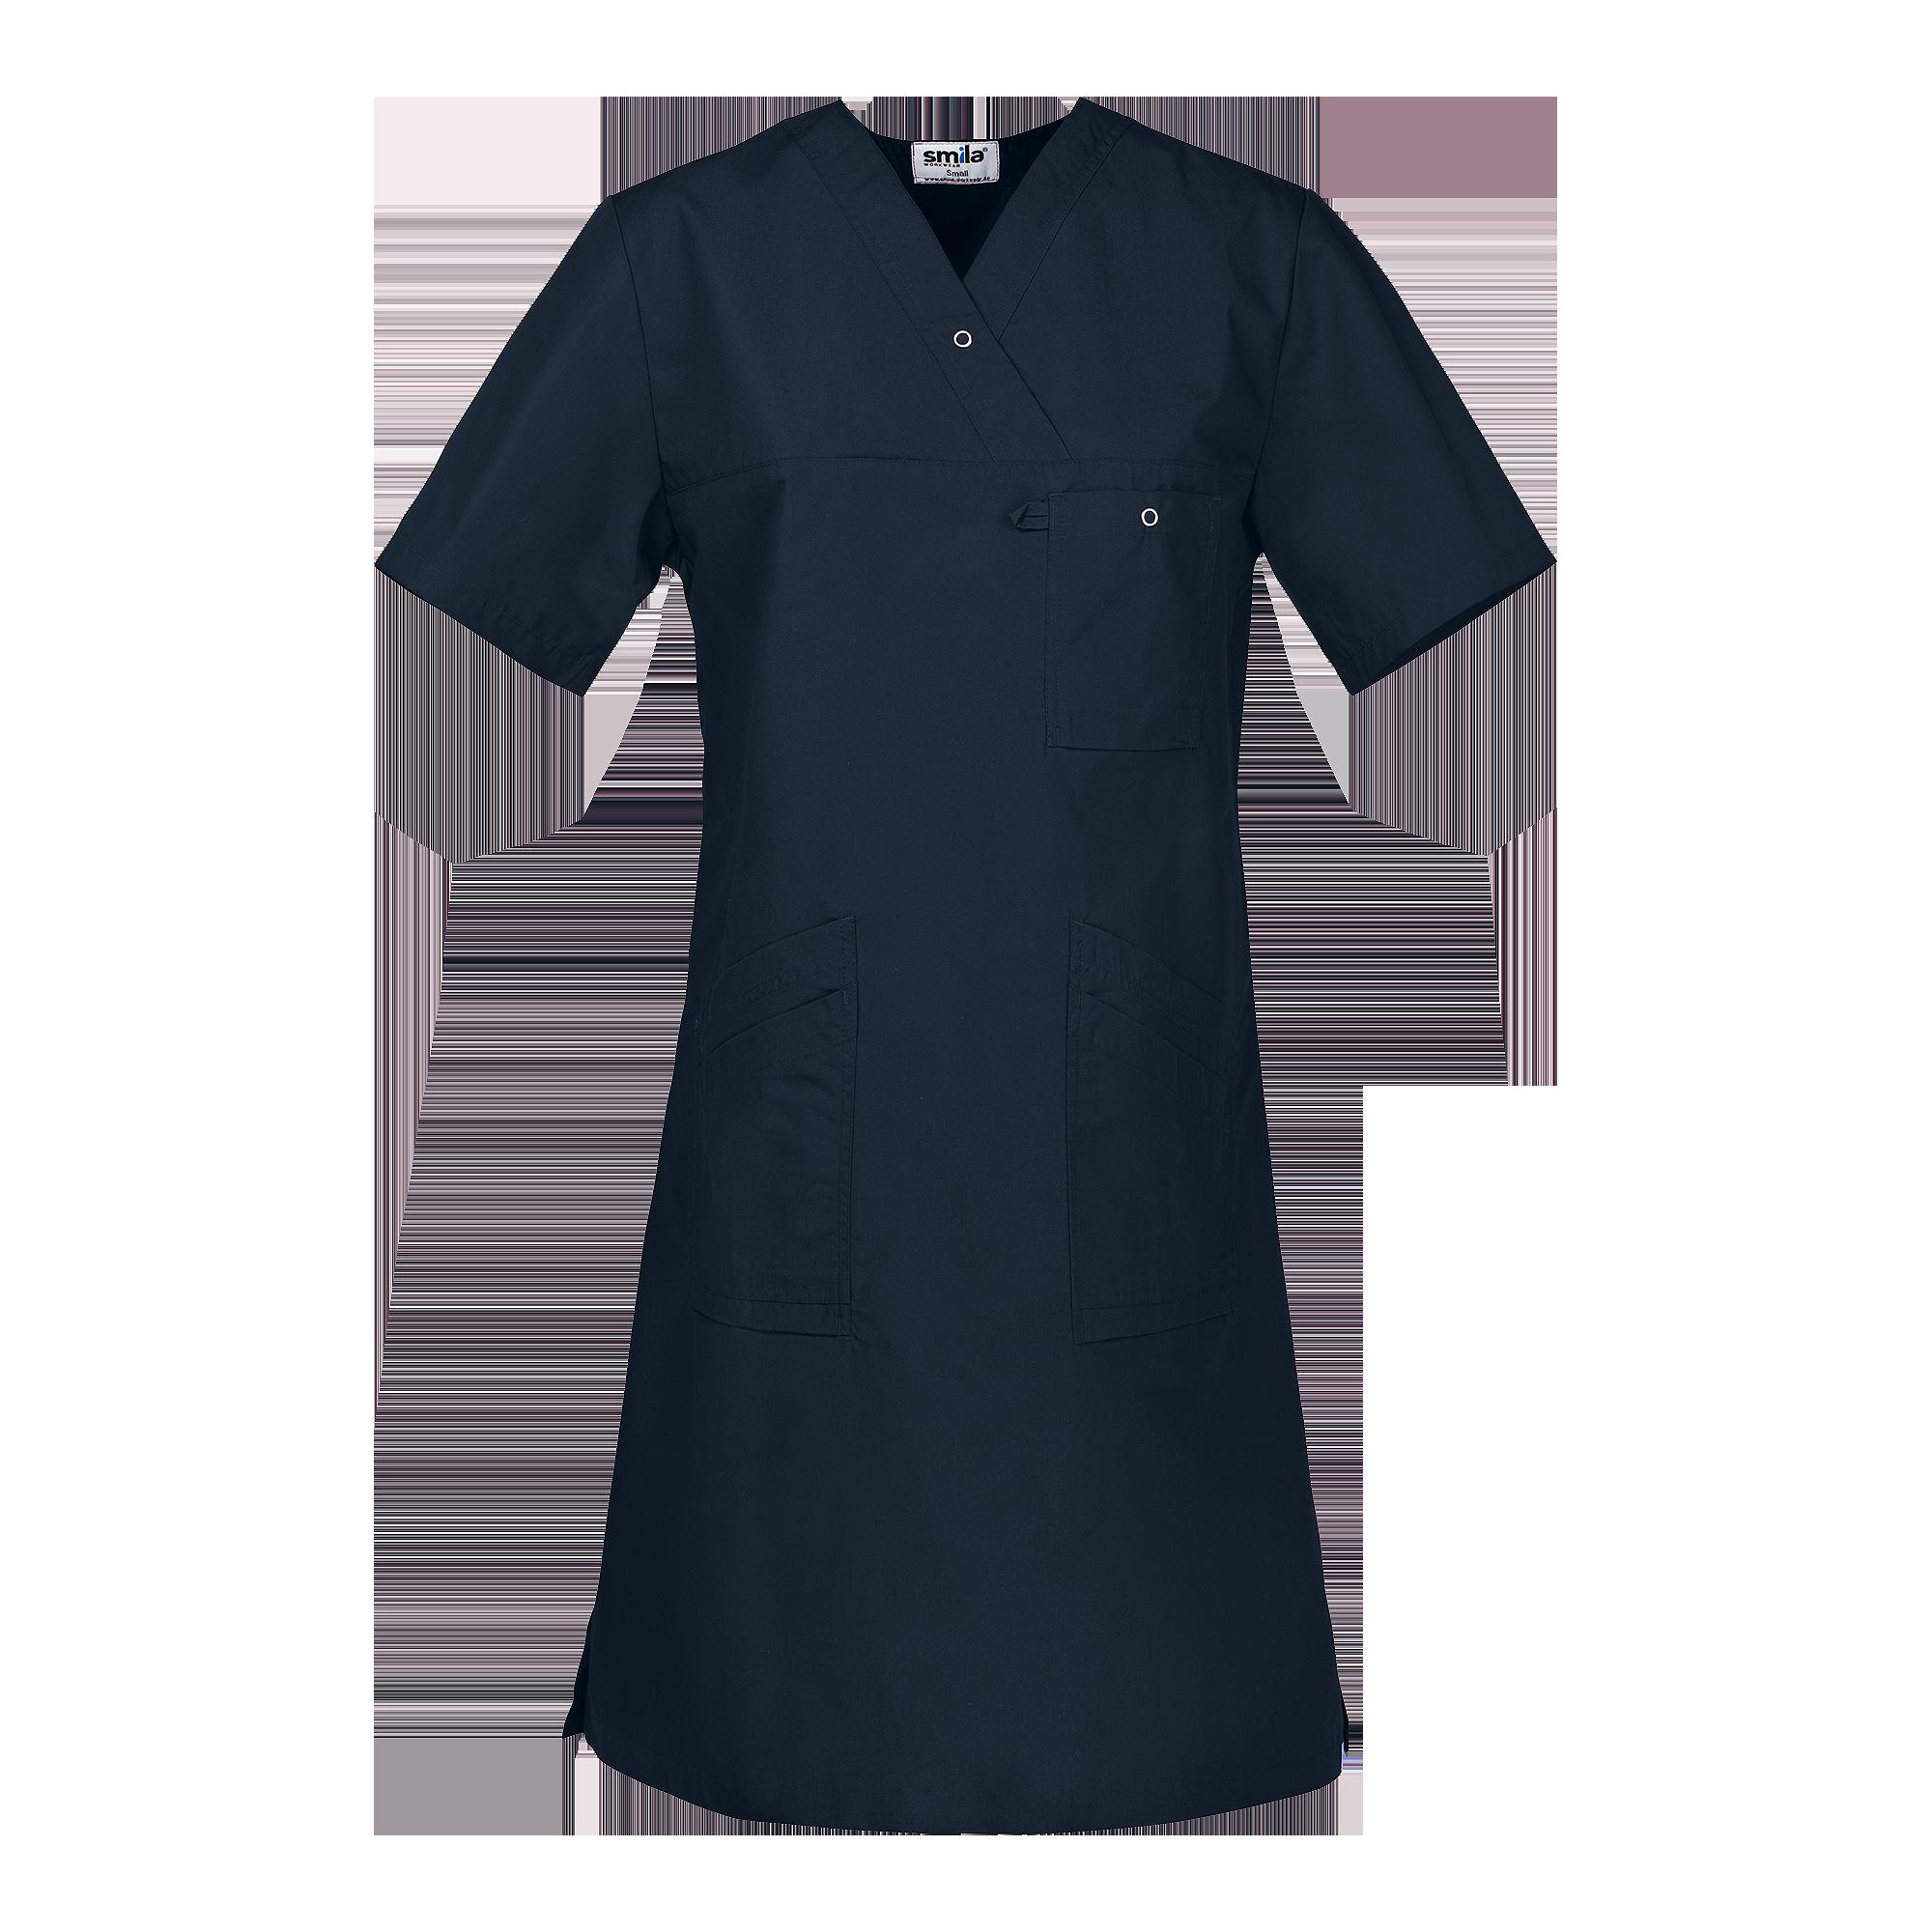 93c2b608e31 Smila marinblå v-ringad klänning - 4. Next. Previous